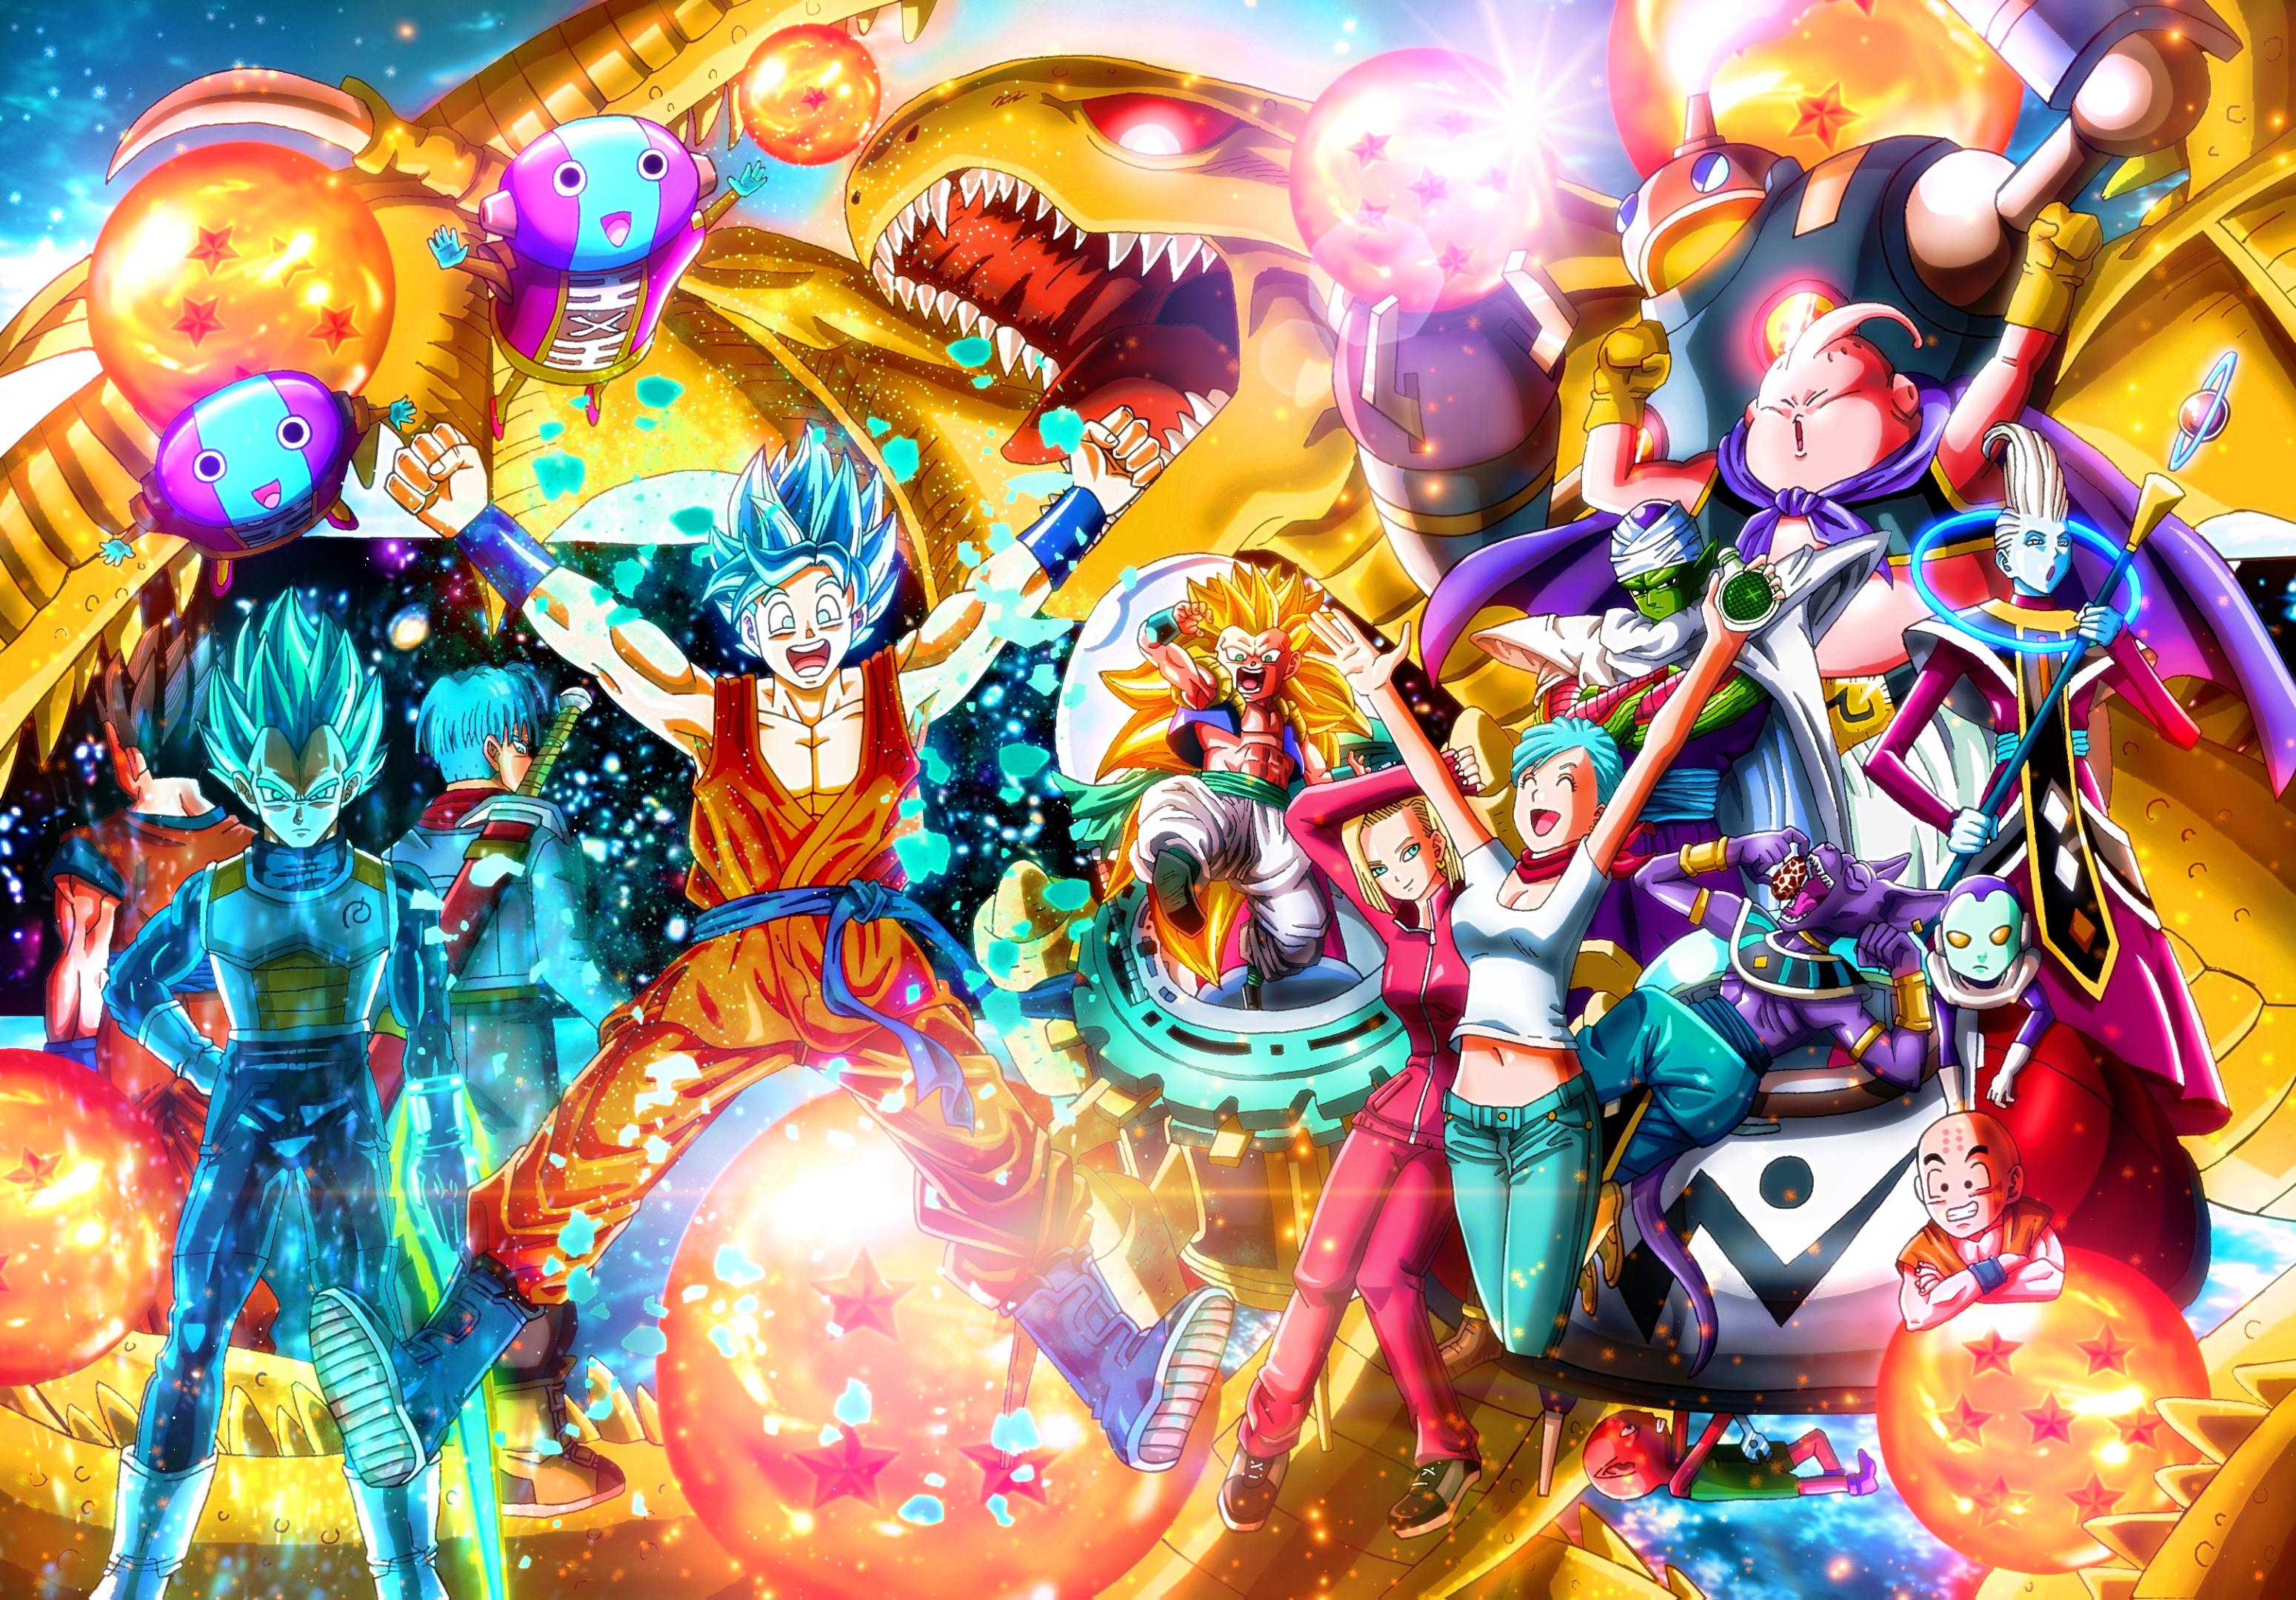 Dragon Ball Super HD Wallpaper | Background Image | 3100x2160 | ID:828897 - Wallpaper Abyss